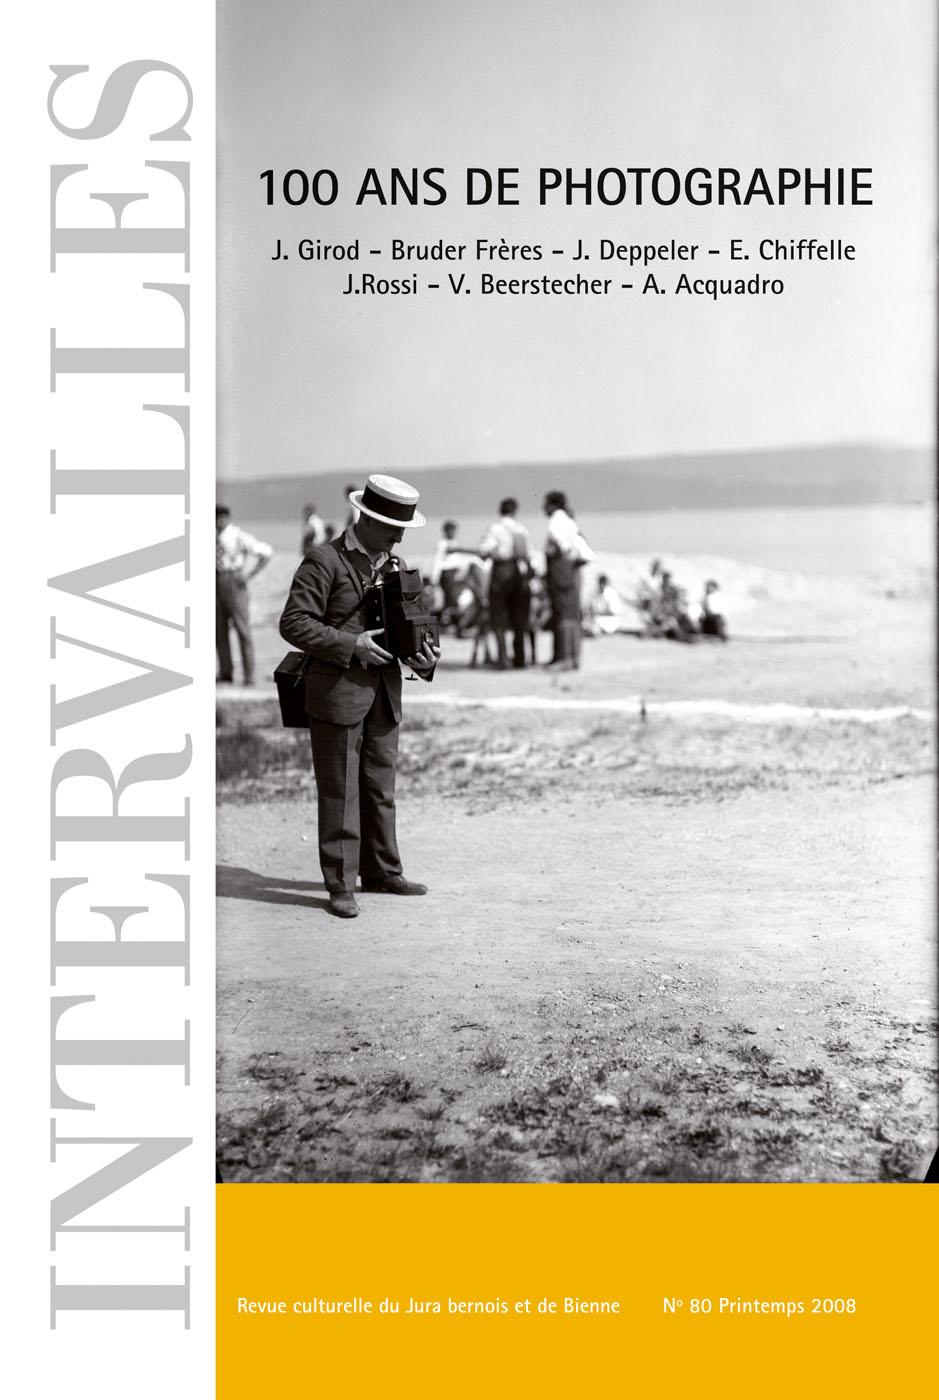 No 80 – 100 ans de photographie